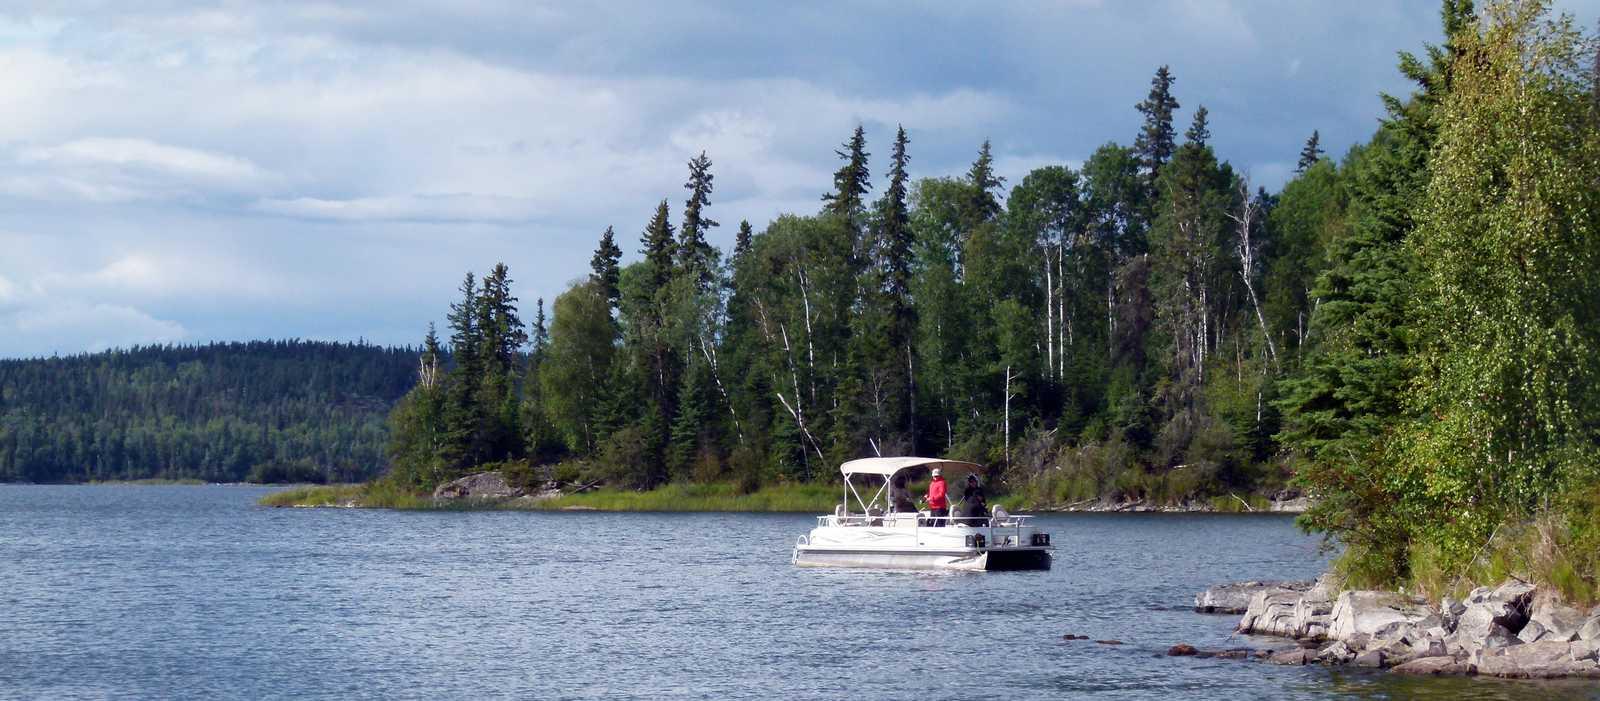 Angelausflug auf dem Otter Lake